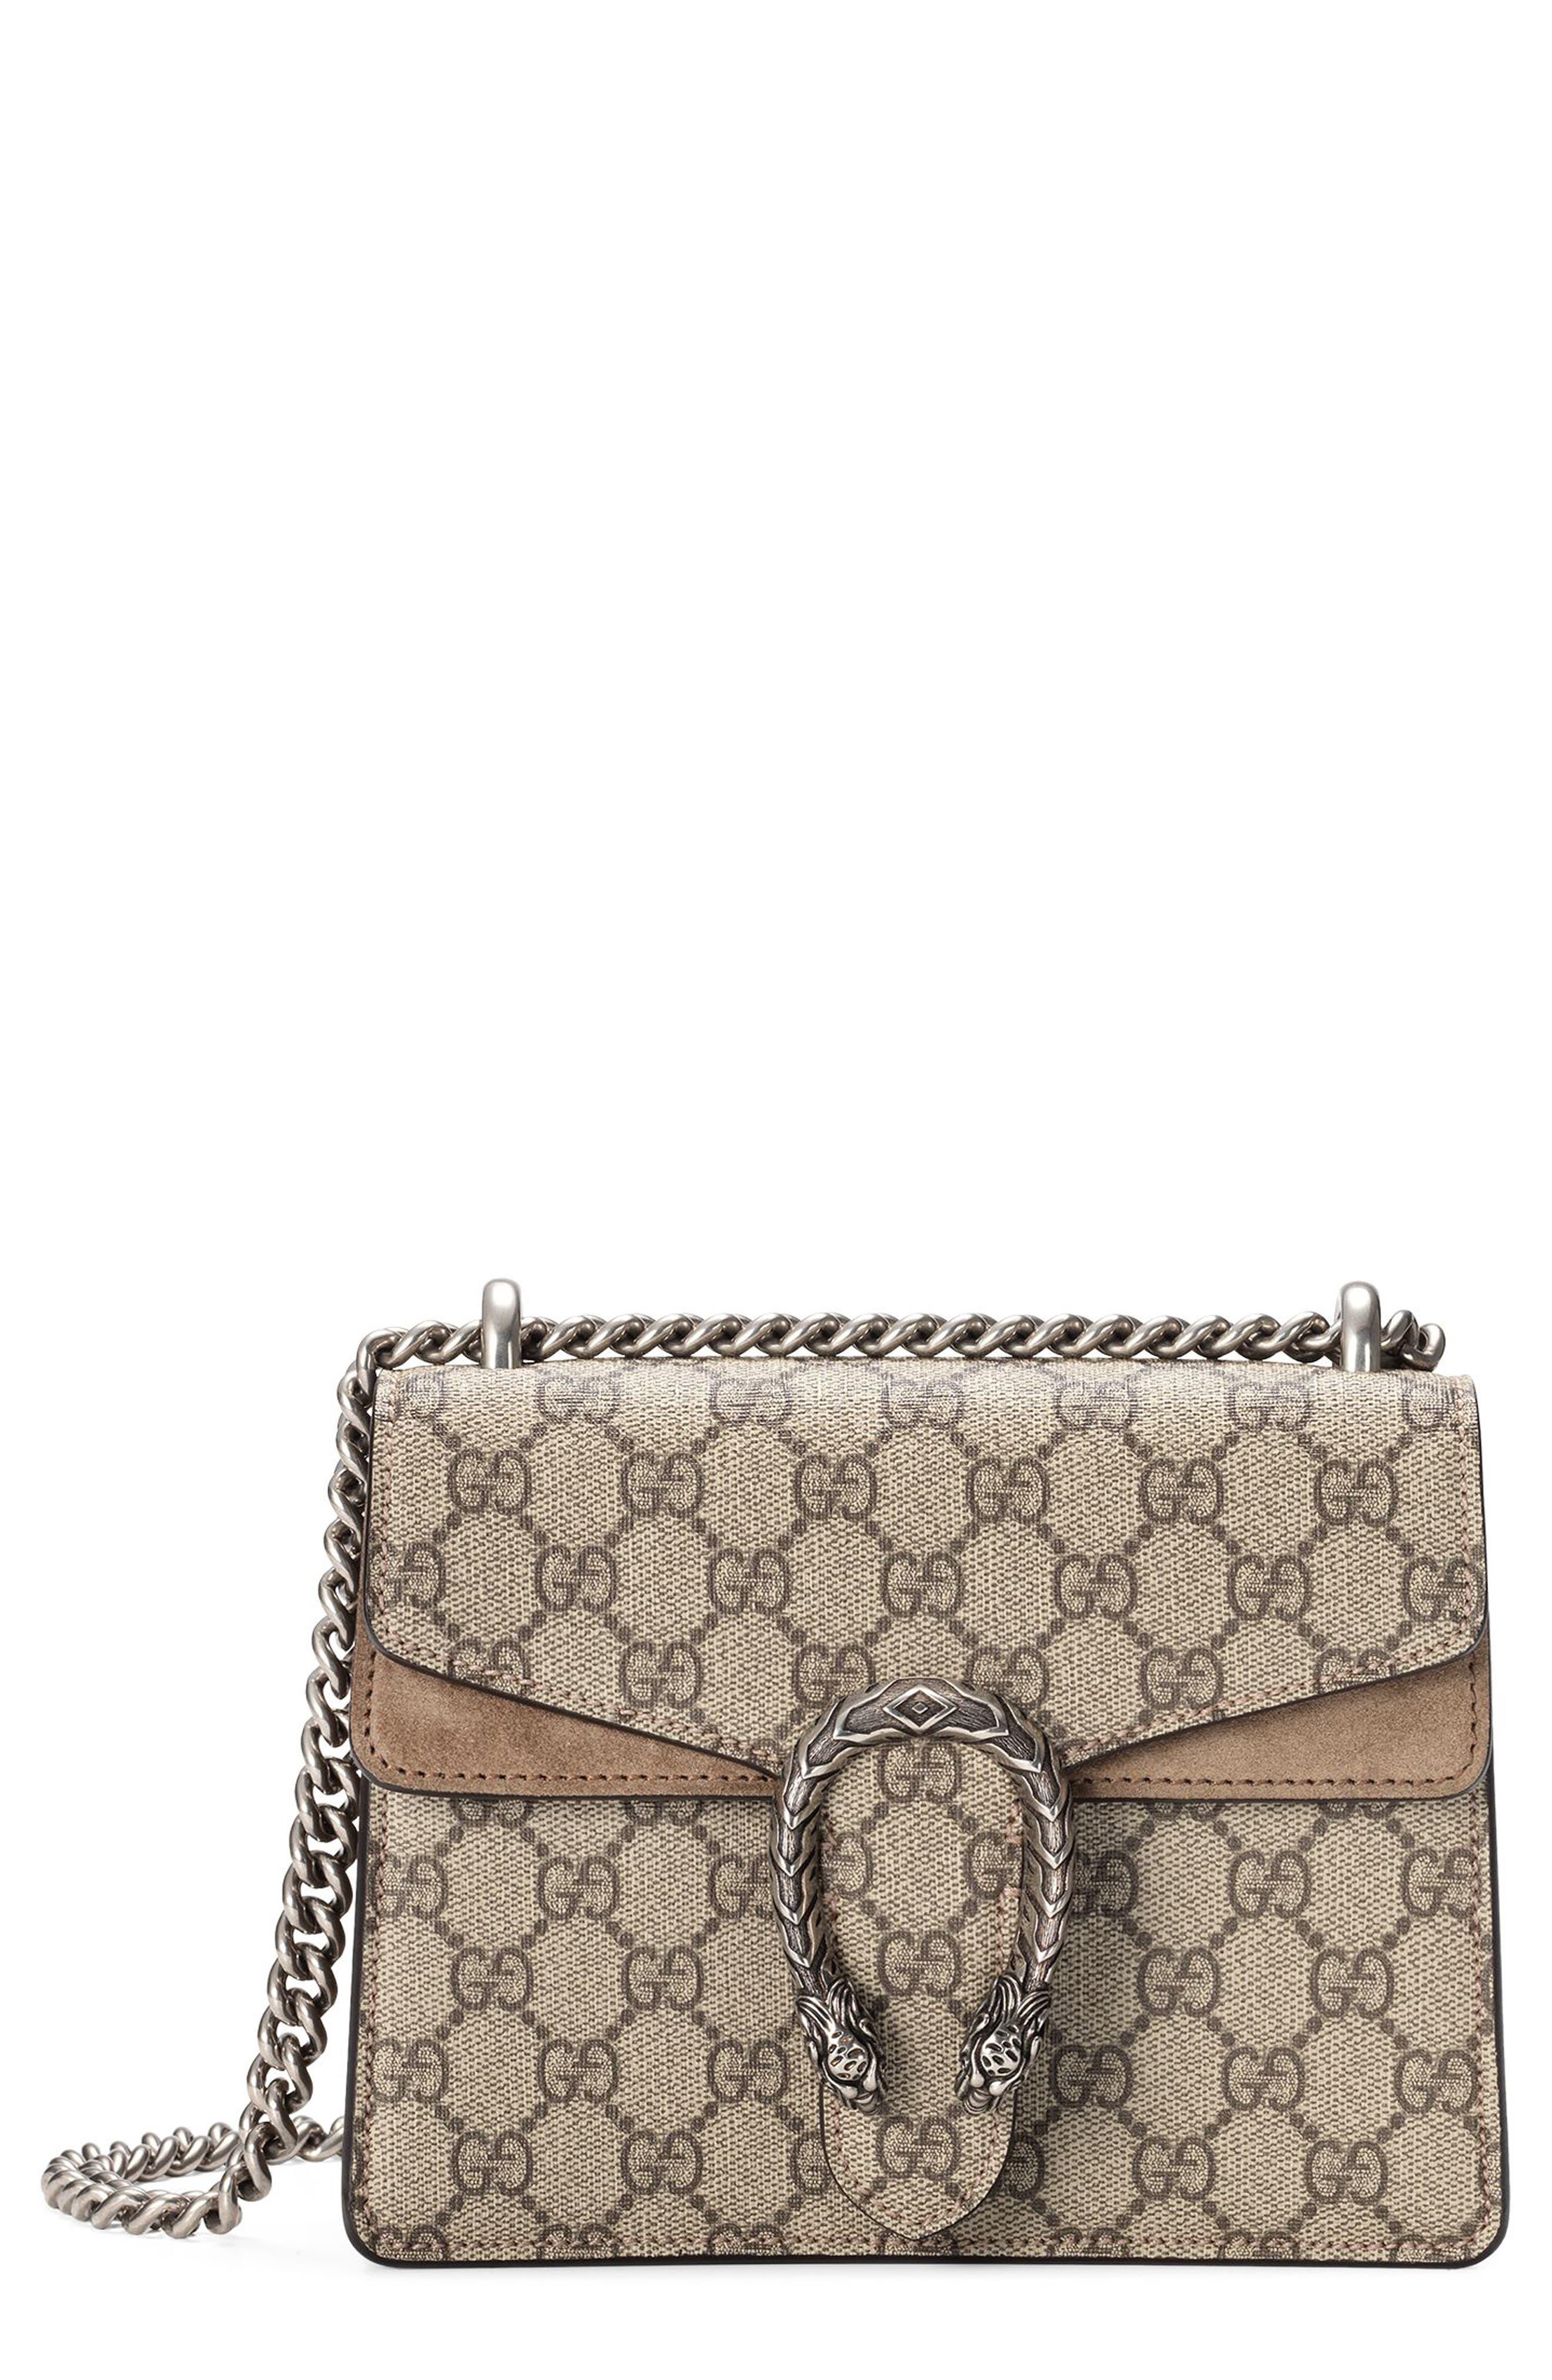 GUCCI Mini Dionysus GG Supreme Shoulder Bag, Main, color, BEIGE EBONY/ TAUPE